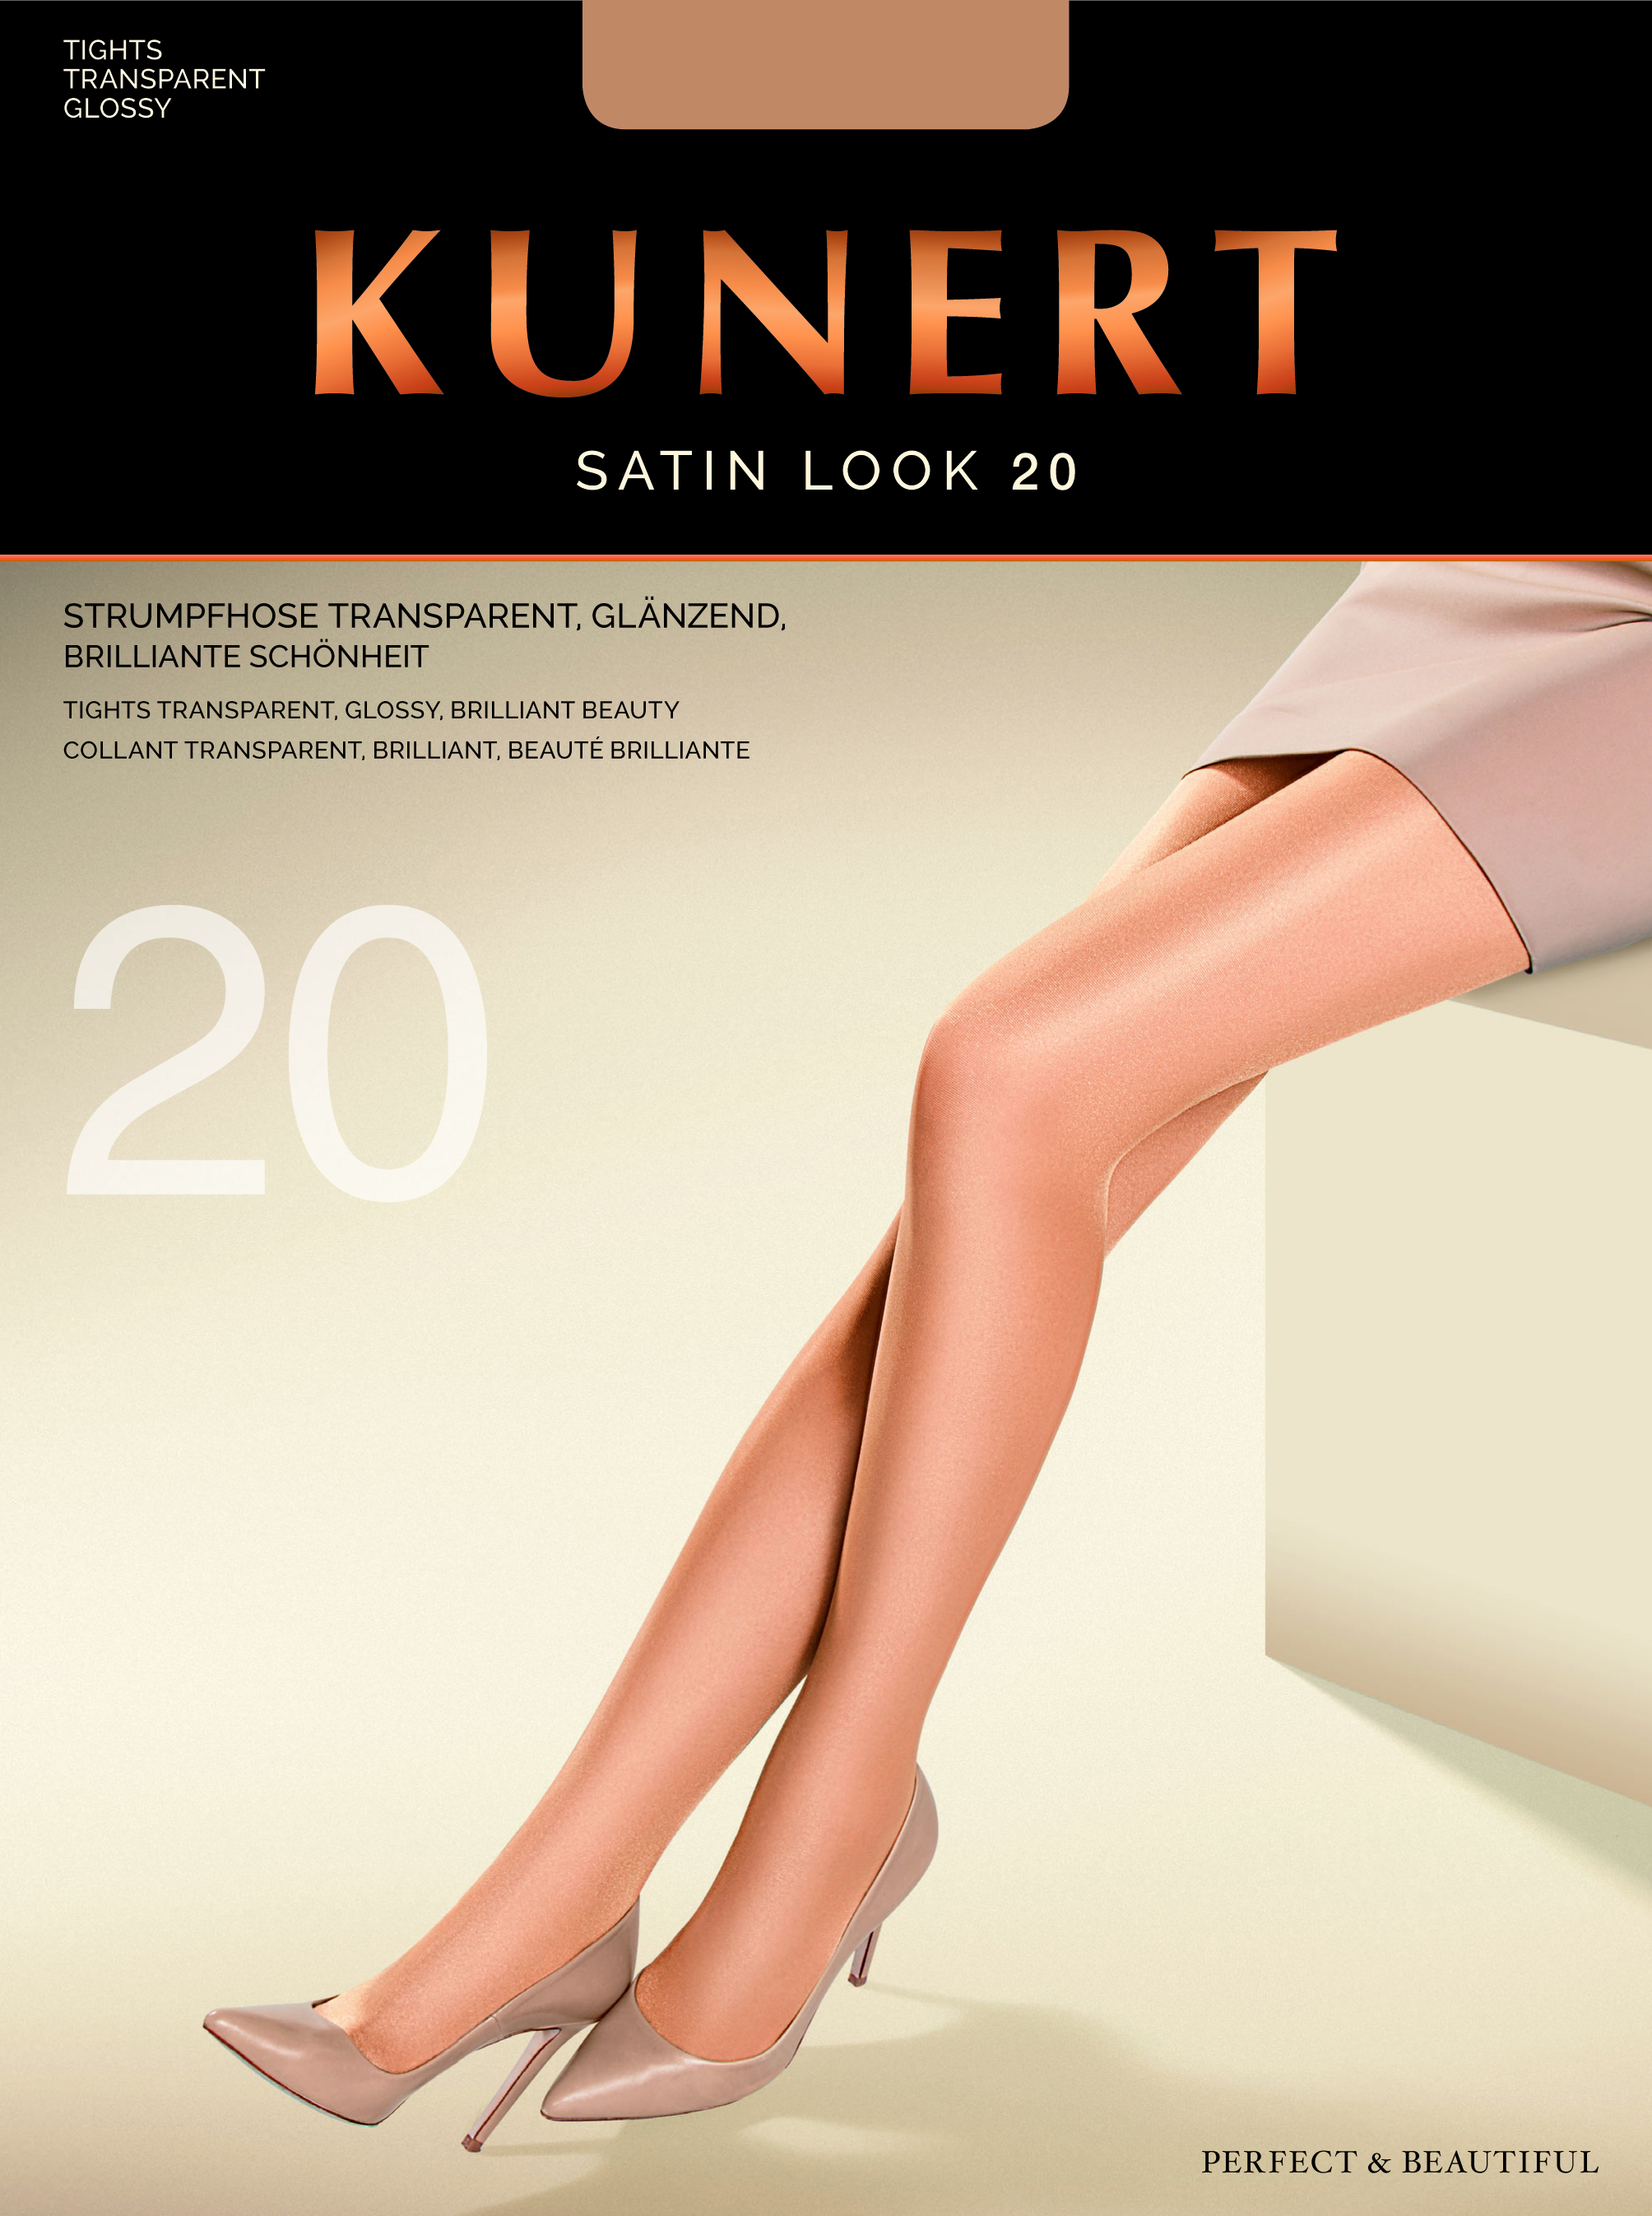 fad6e1682 Kunert Satin Look 20 - Elegant glossy tights   9989